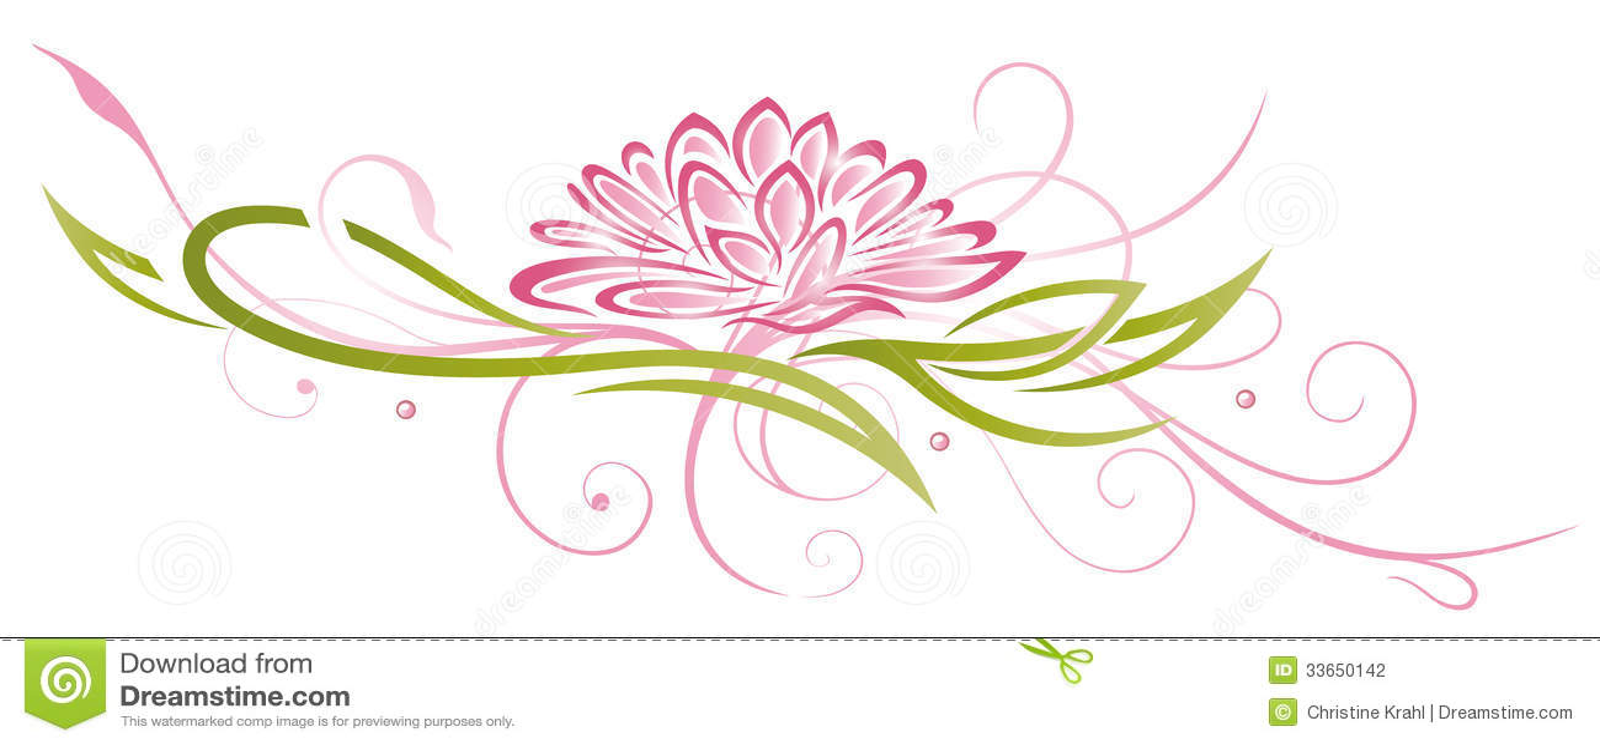 Lotus flowers pink stock vector illustration of lifestyle 33650142 lotus flowers pink izmirmasajfo